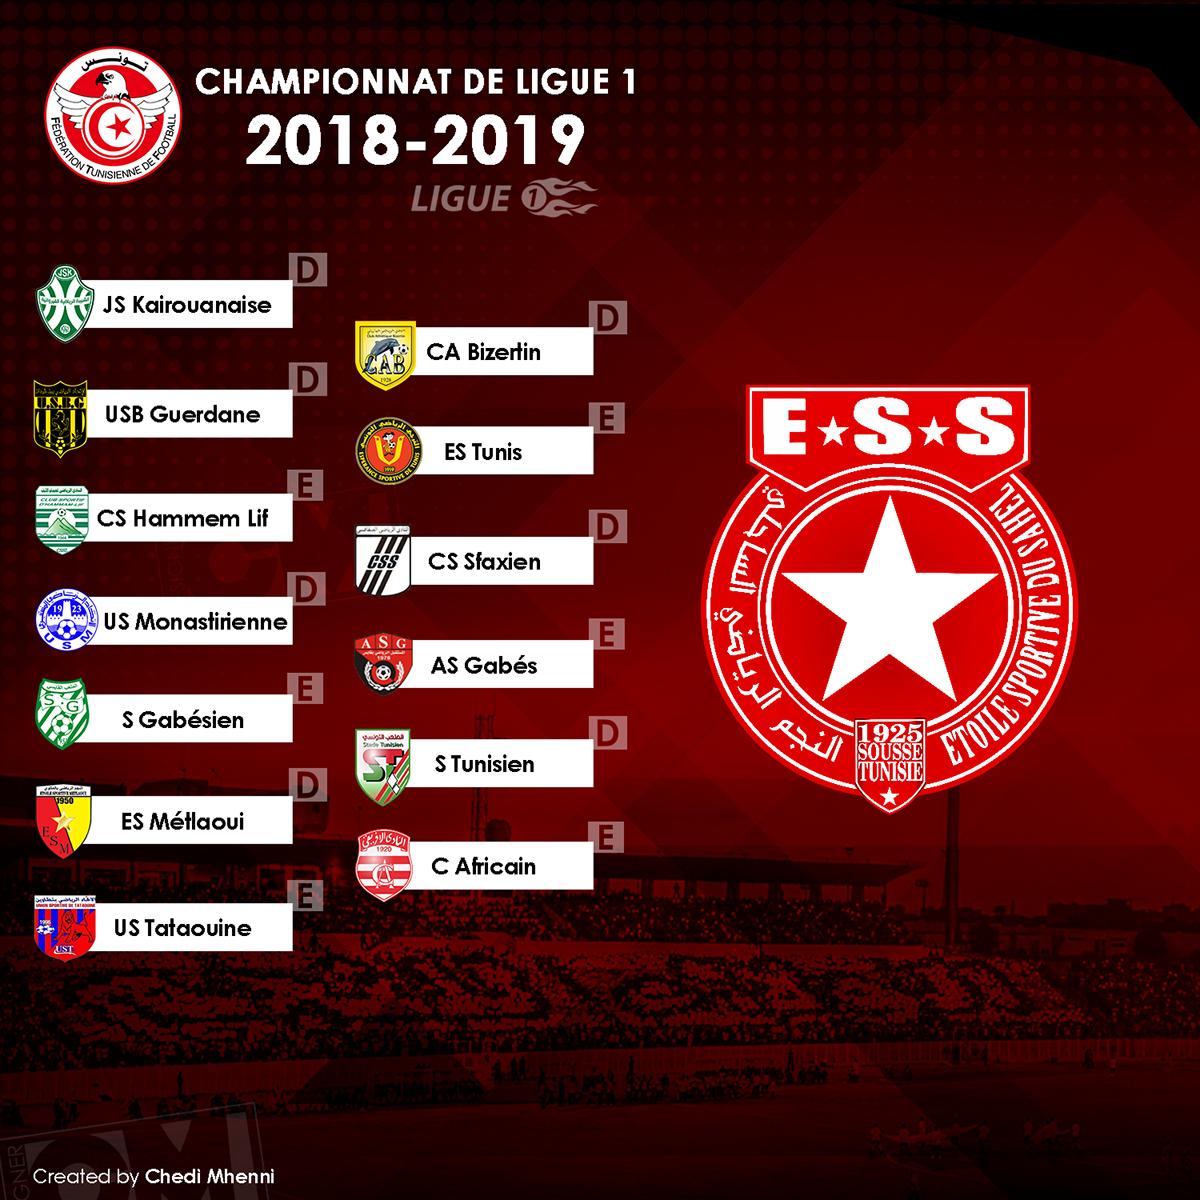 Calendrier Championnat Tunisien.Calendrier Championnat De Tunisie 2018 2019 On Behance